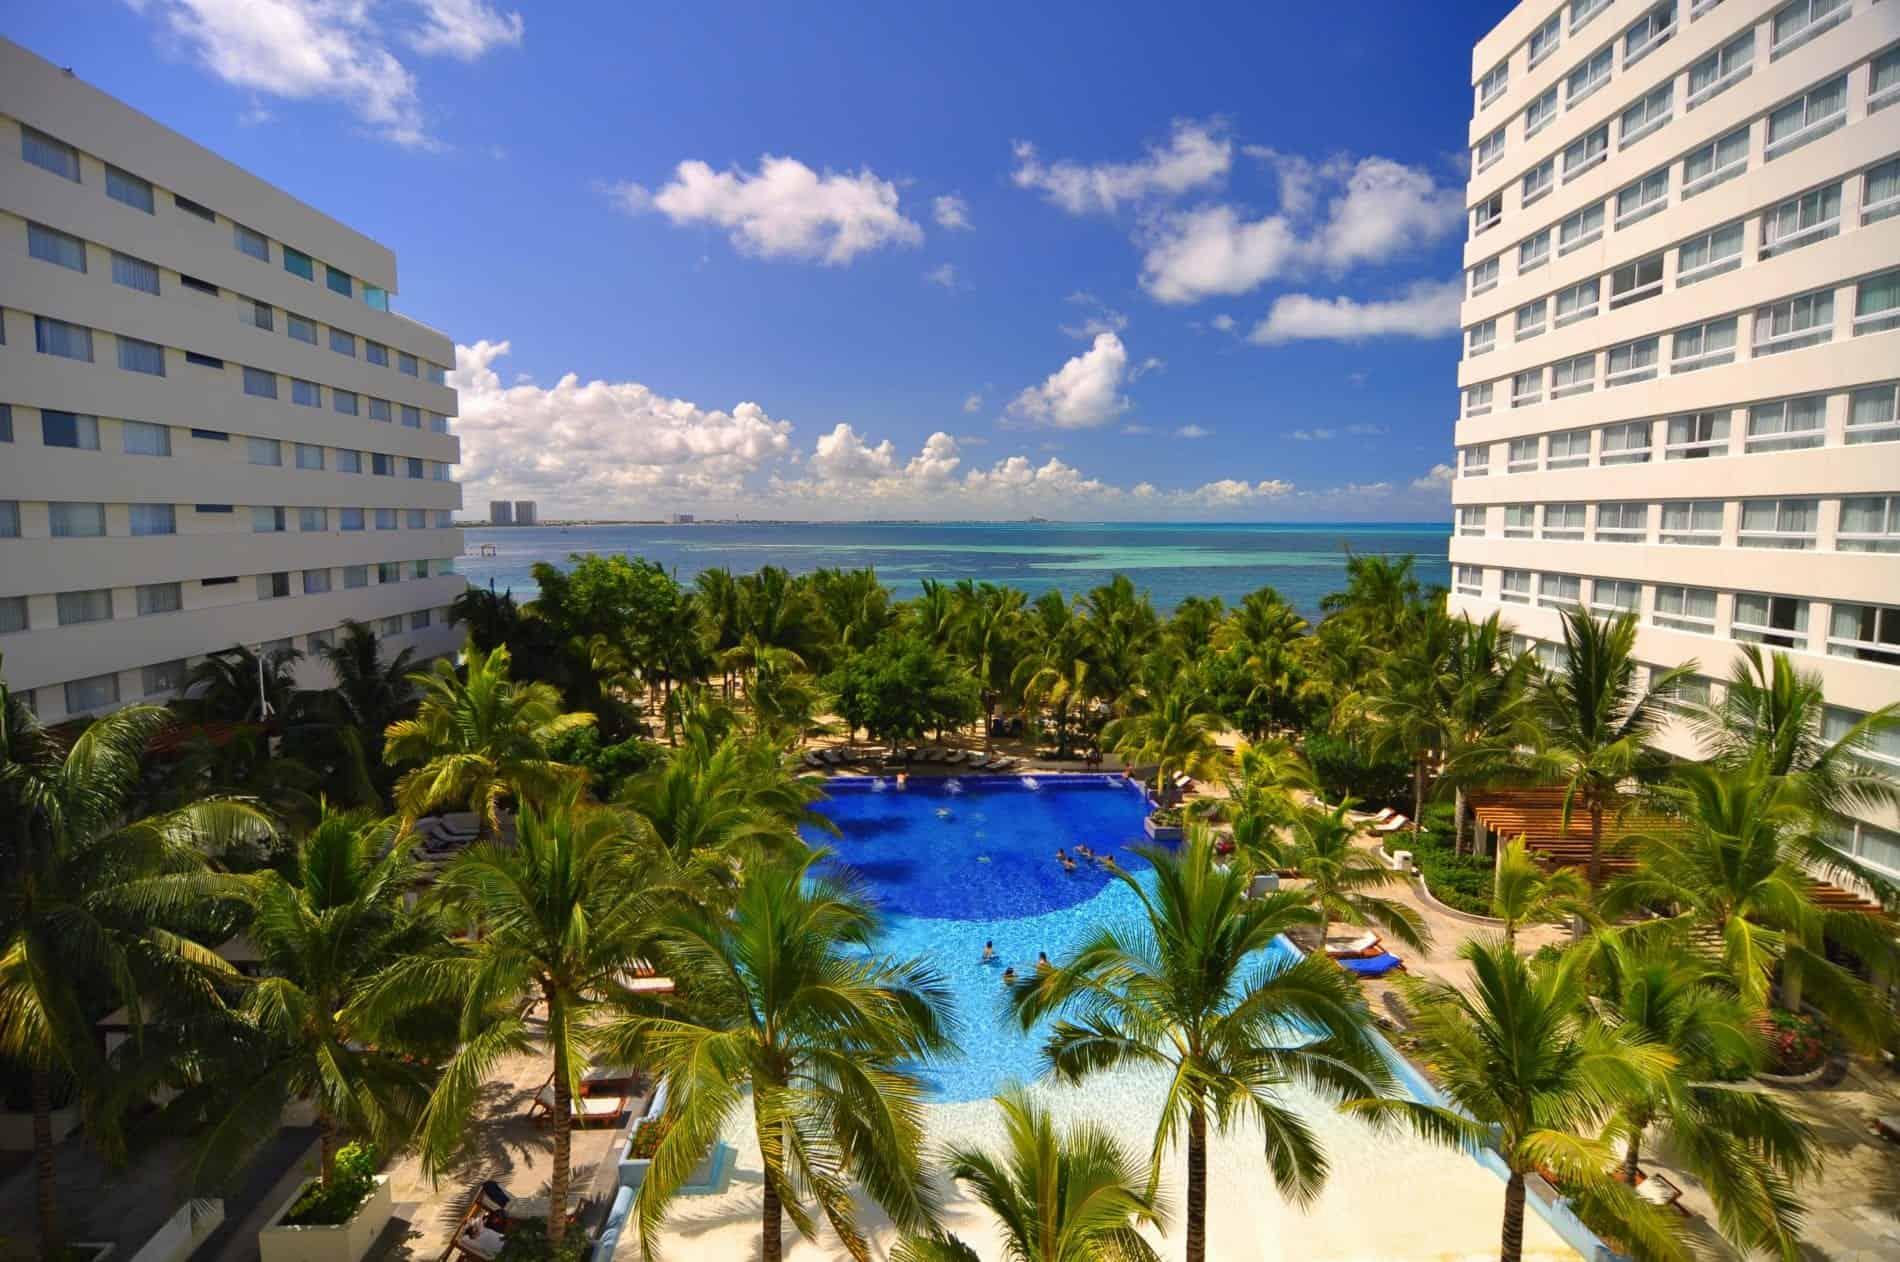 Grand Oasis Resort Cancun beach holiday